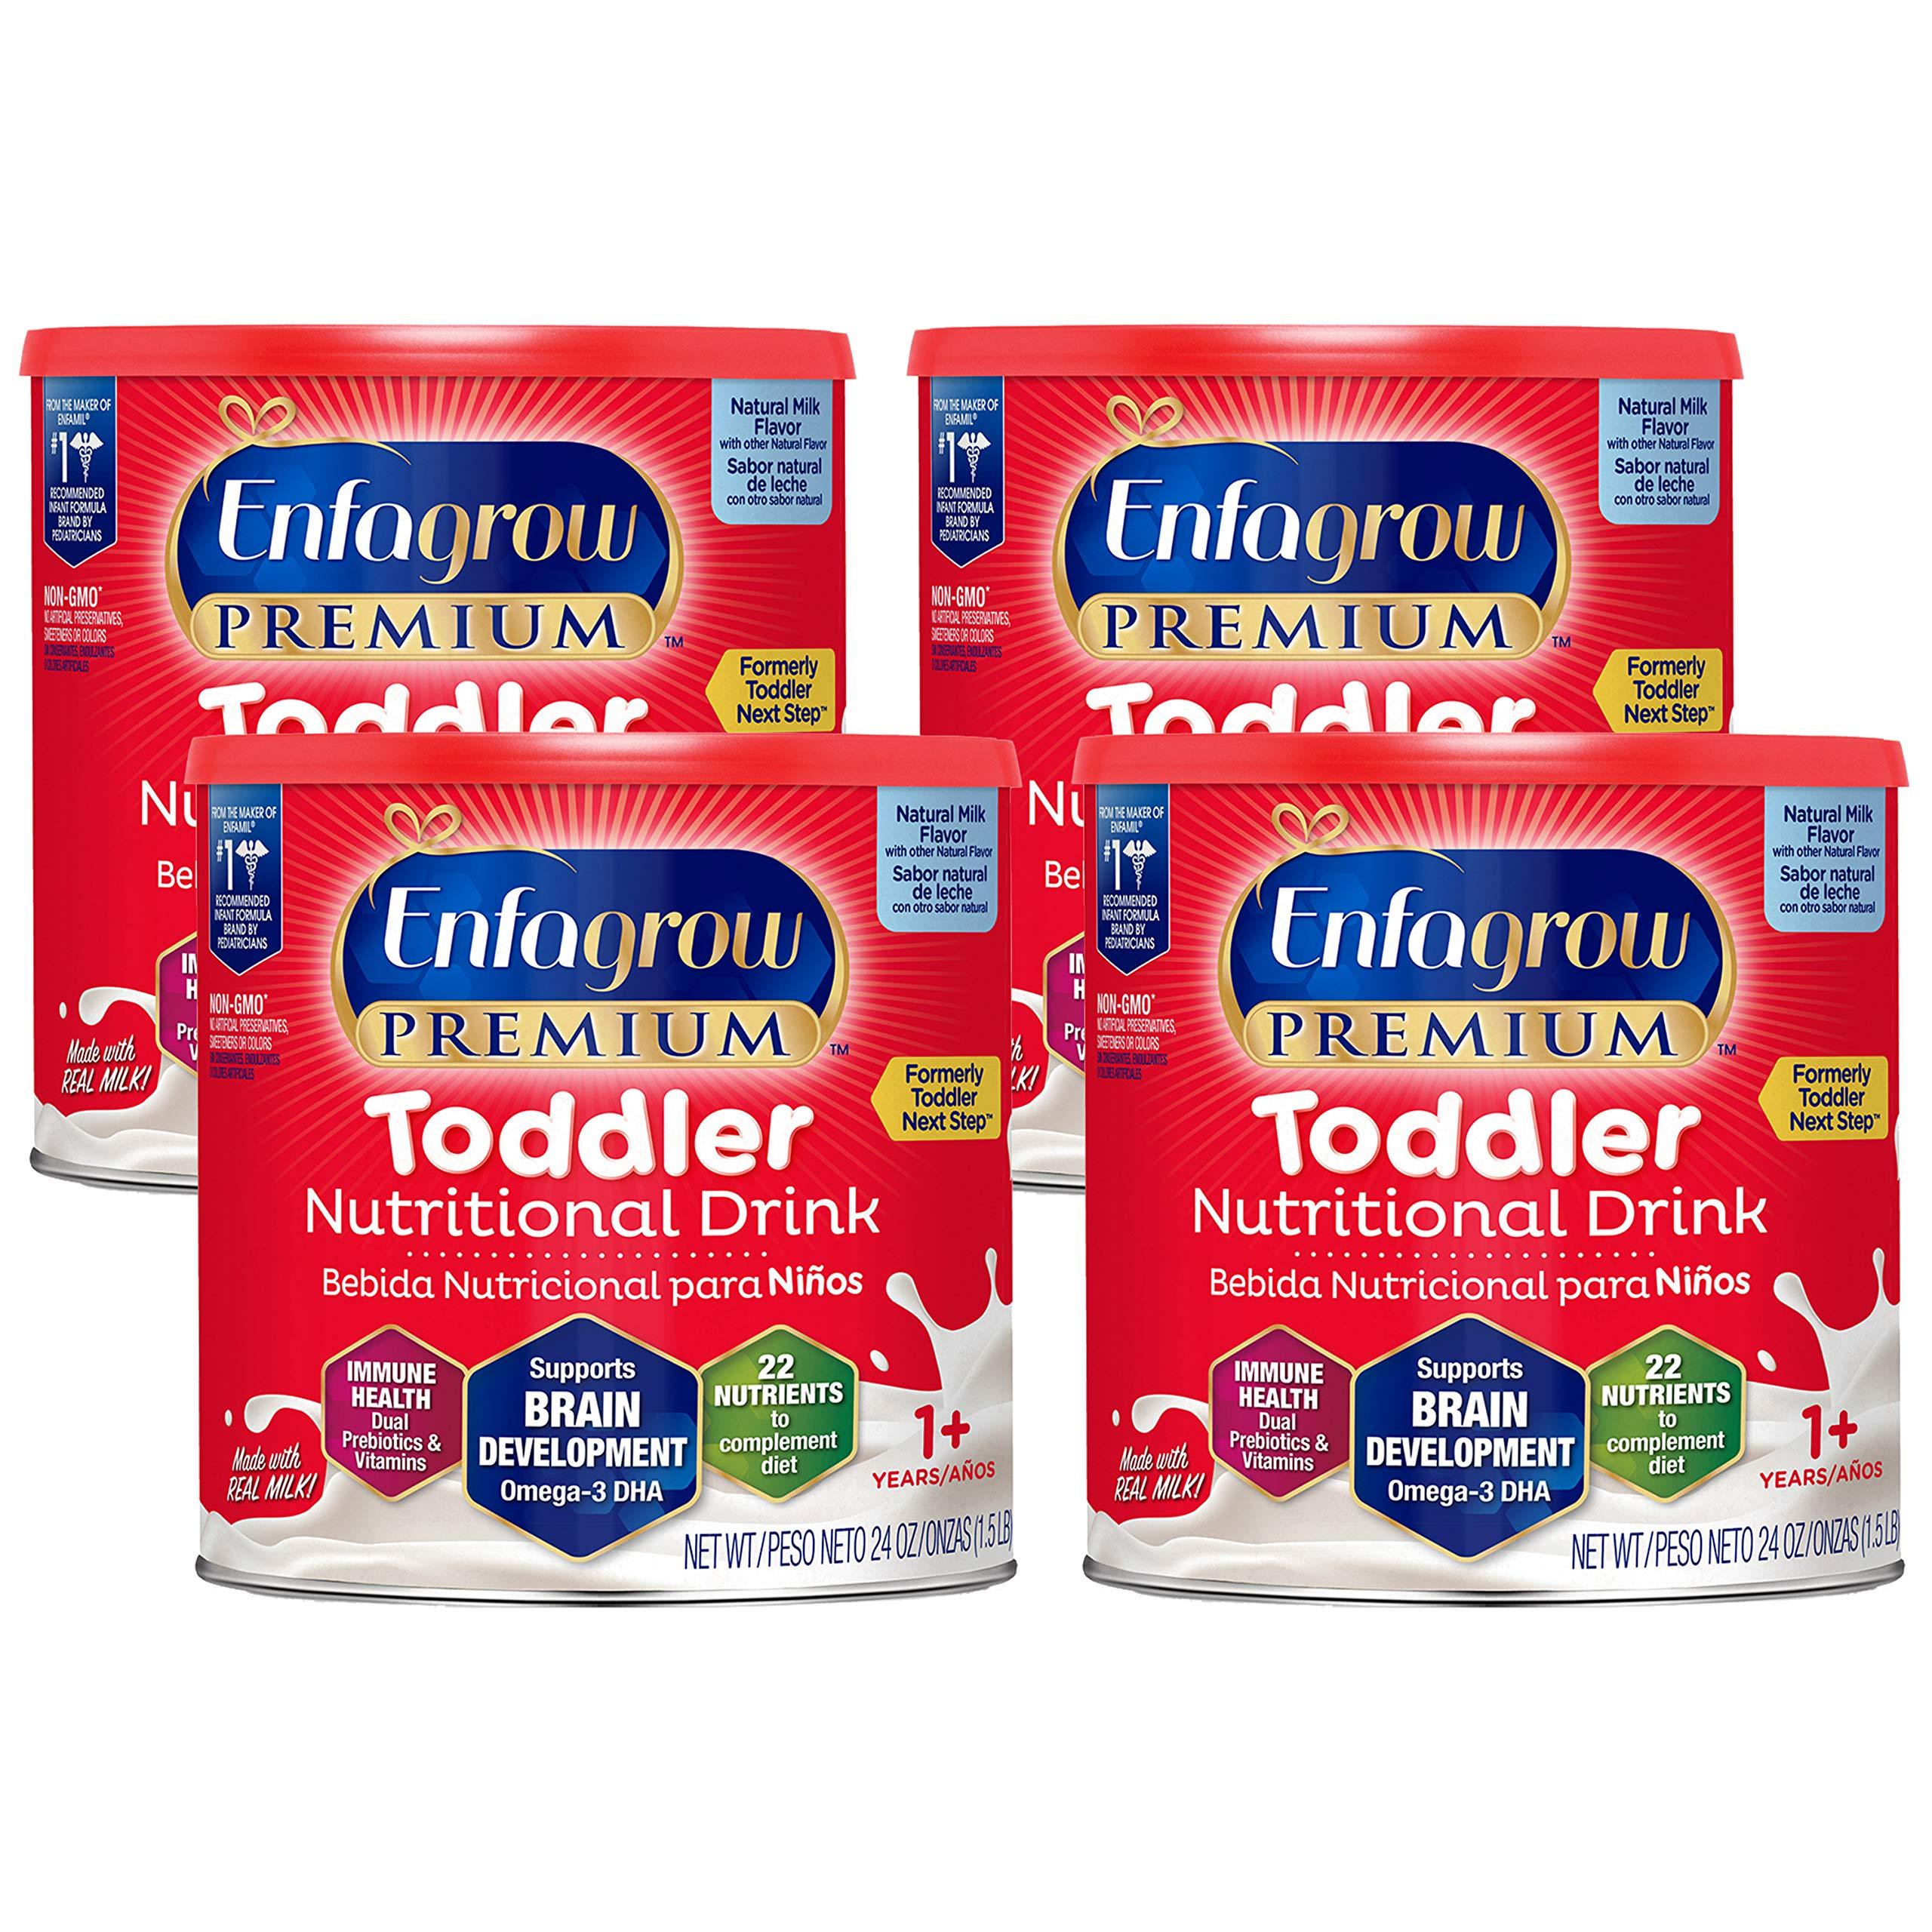 Enfagrow PREMIUM Toddler Nutritional Drink, Natural Milk Flavor, Omega-3 DHA & MGFM for Brain Support, Prebiotics & Vitamins for Immune Health, Non-GMO, Powder Can, 24 Oz (Pack of 4)